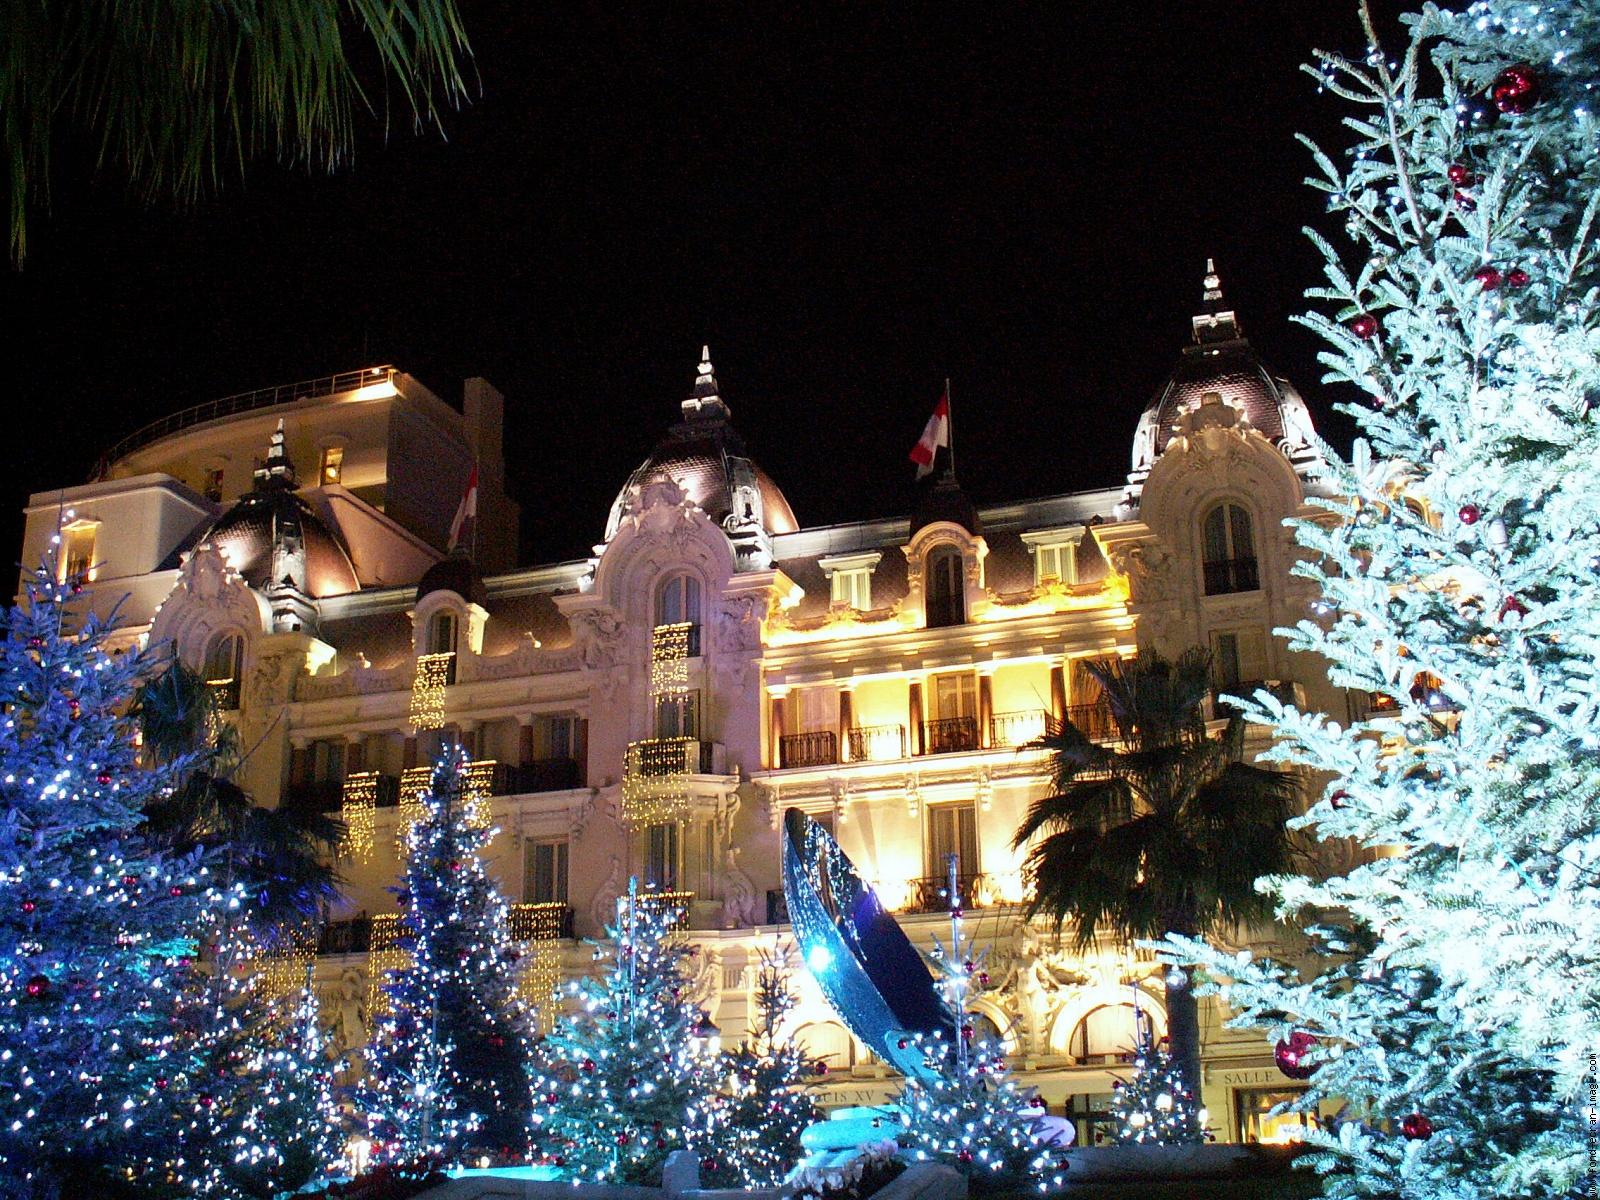 Passion For Luxury Hotel De Paris A Luxury Monaco Jewel